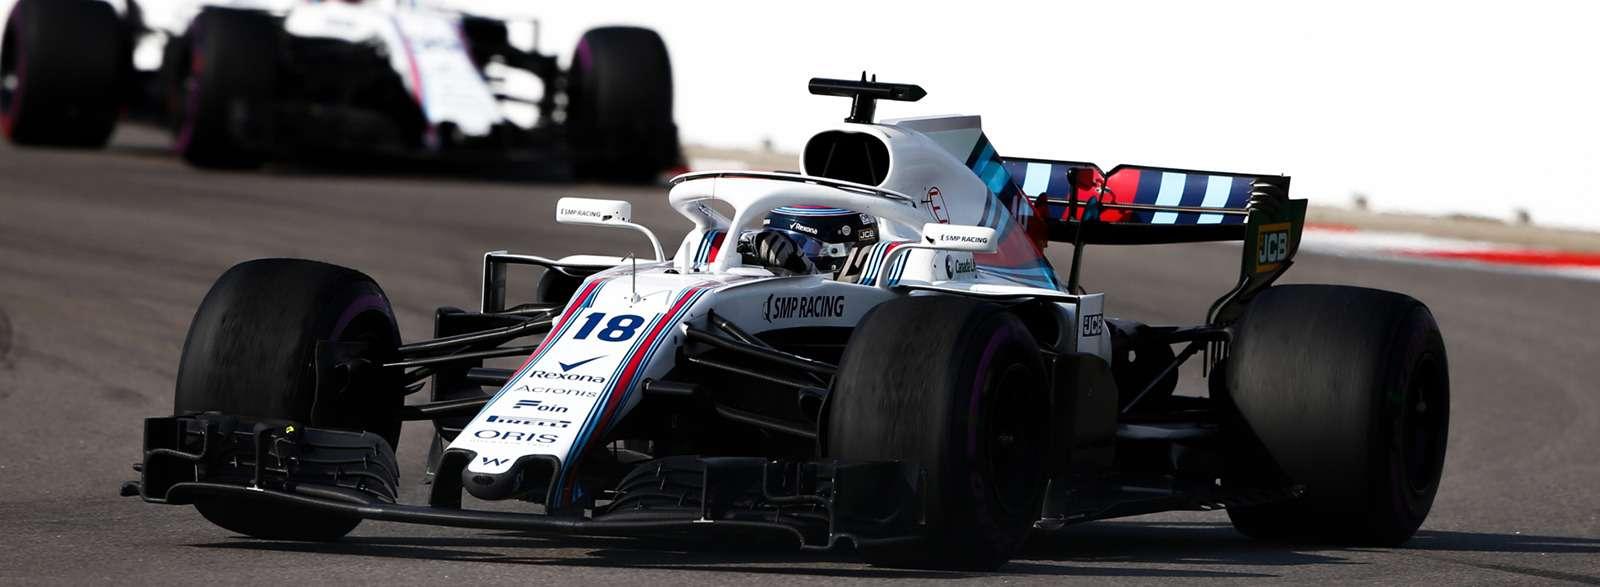 Формула 1: Mercedes освистали наГран-При России— фото 909879